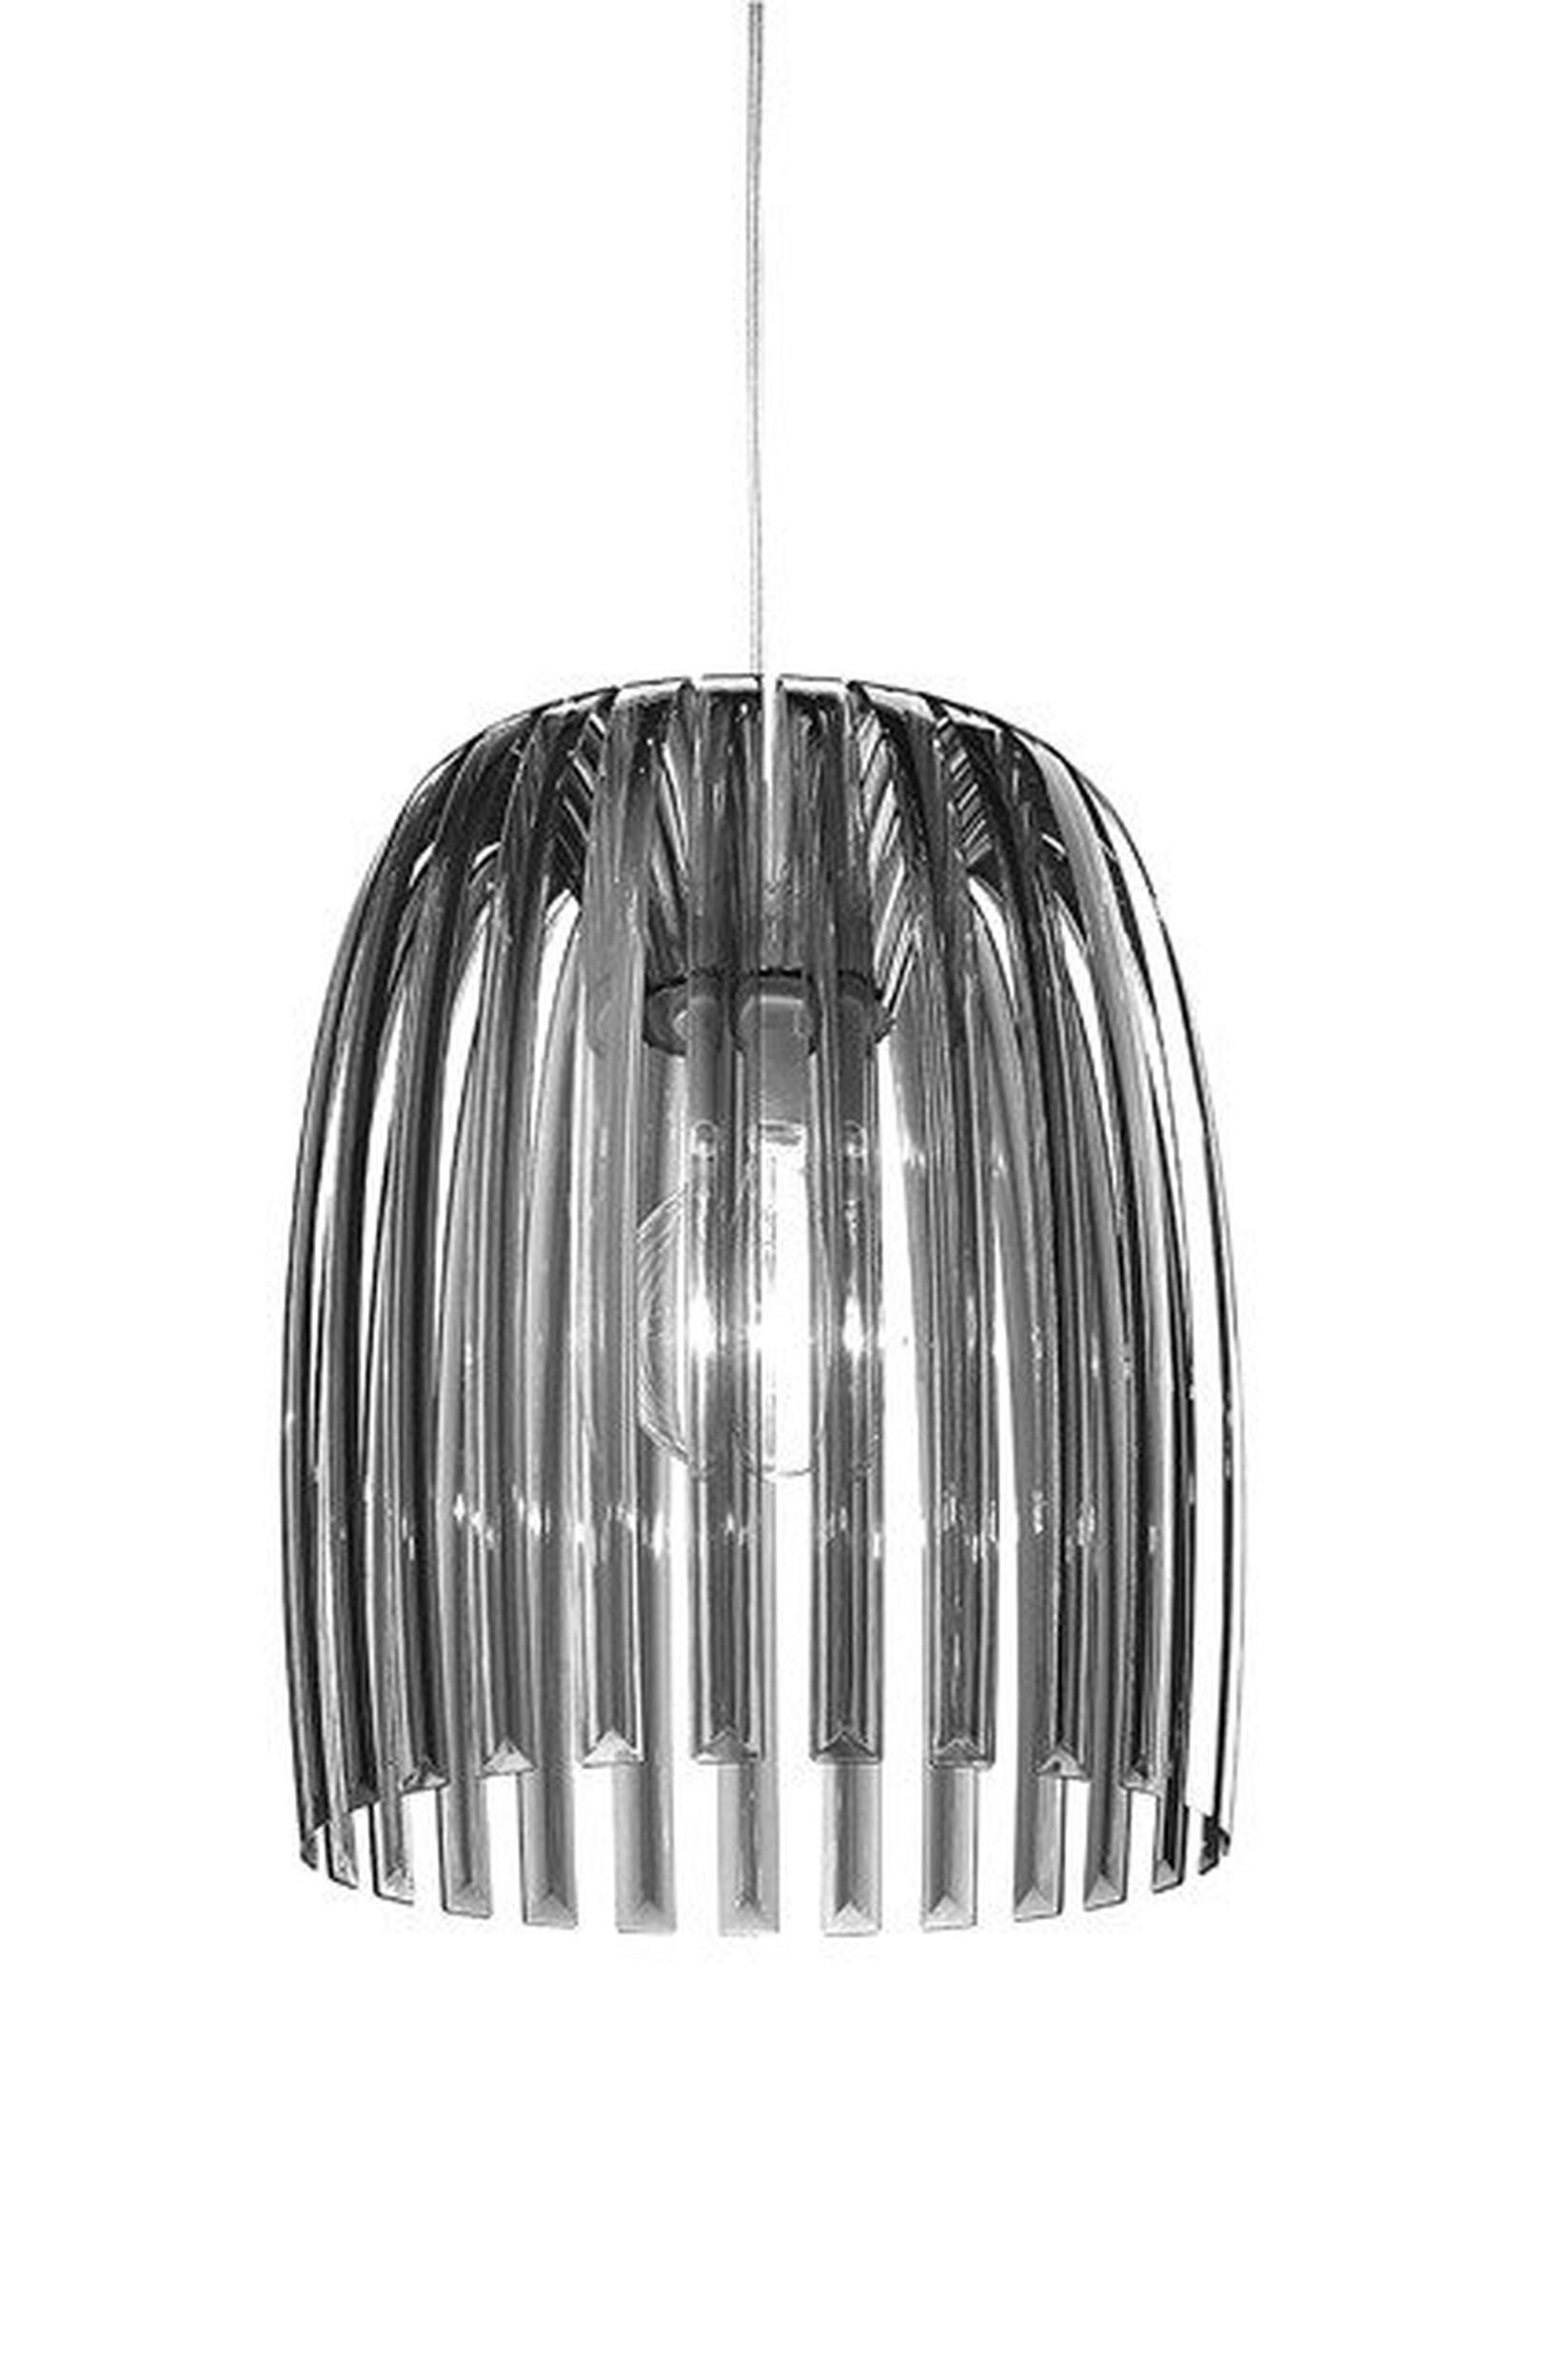 Lampa Josephine antracytowa